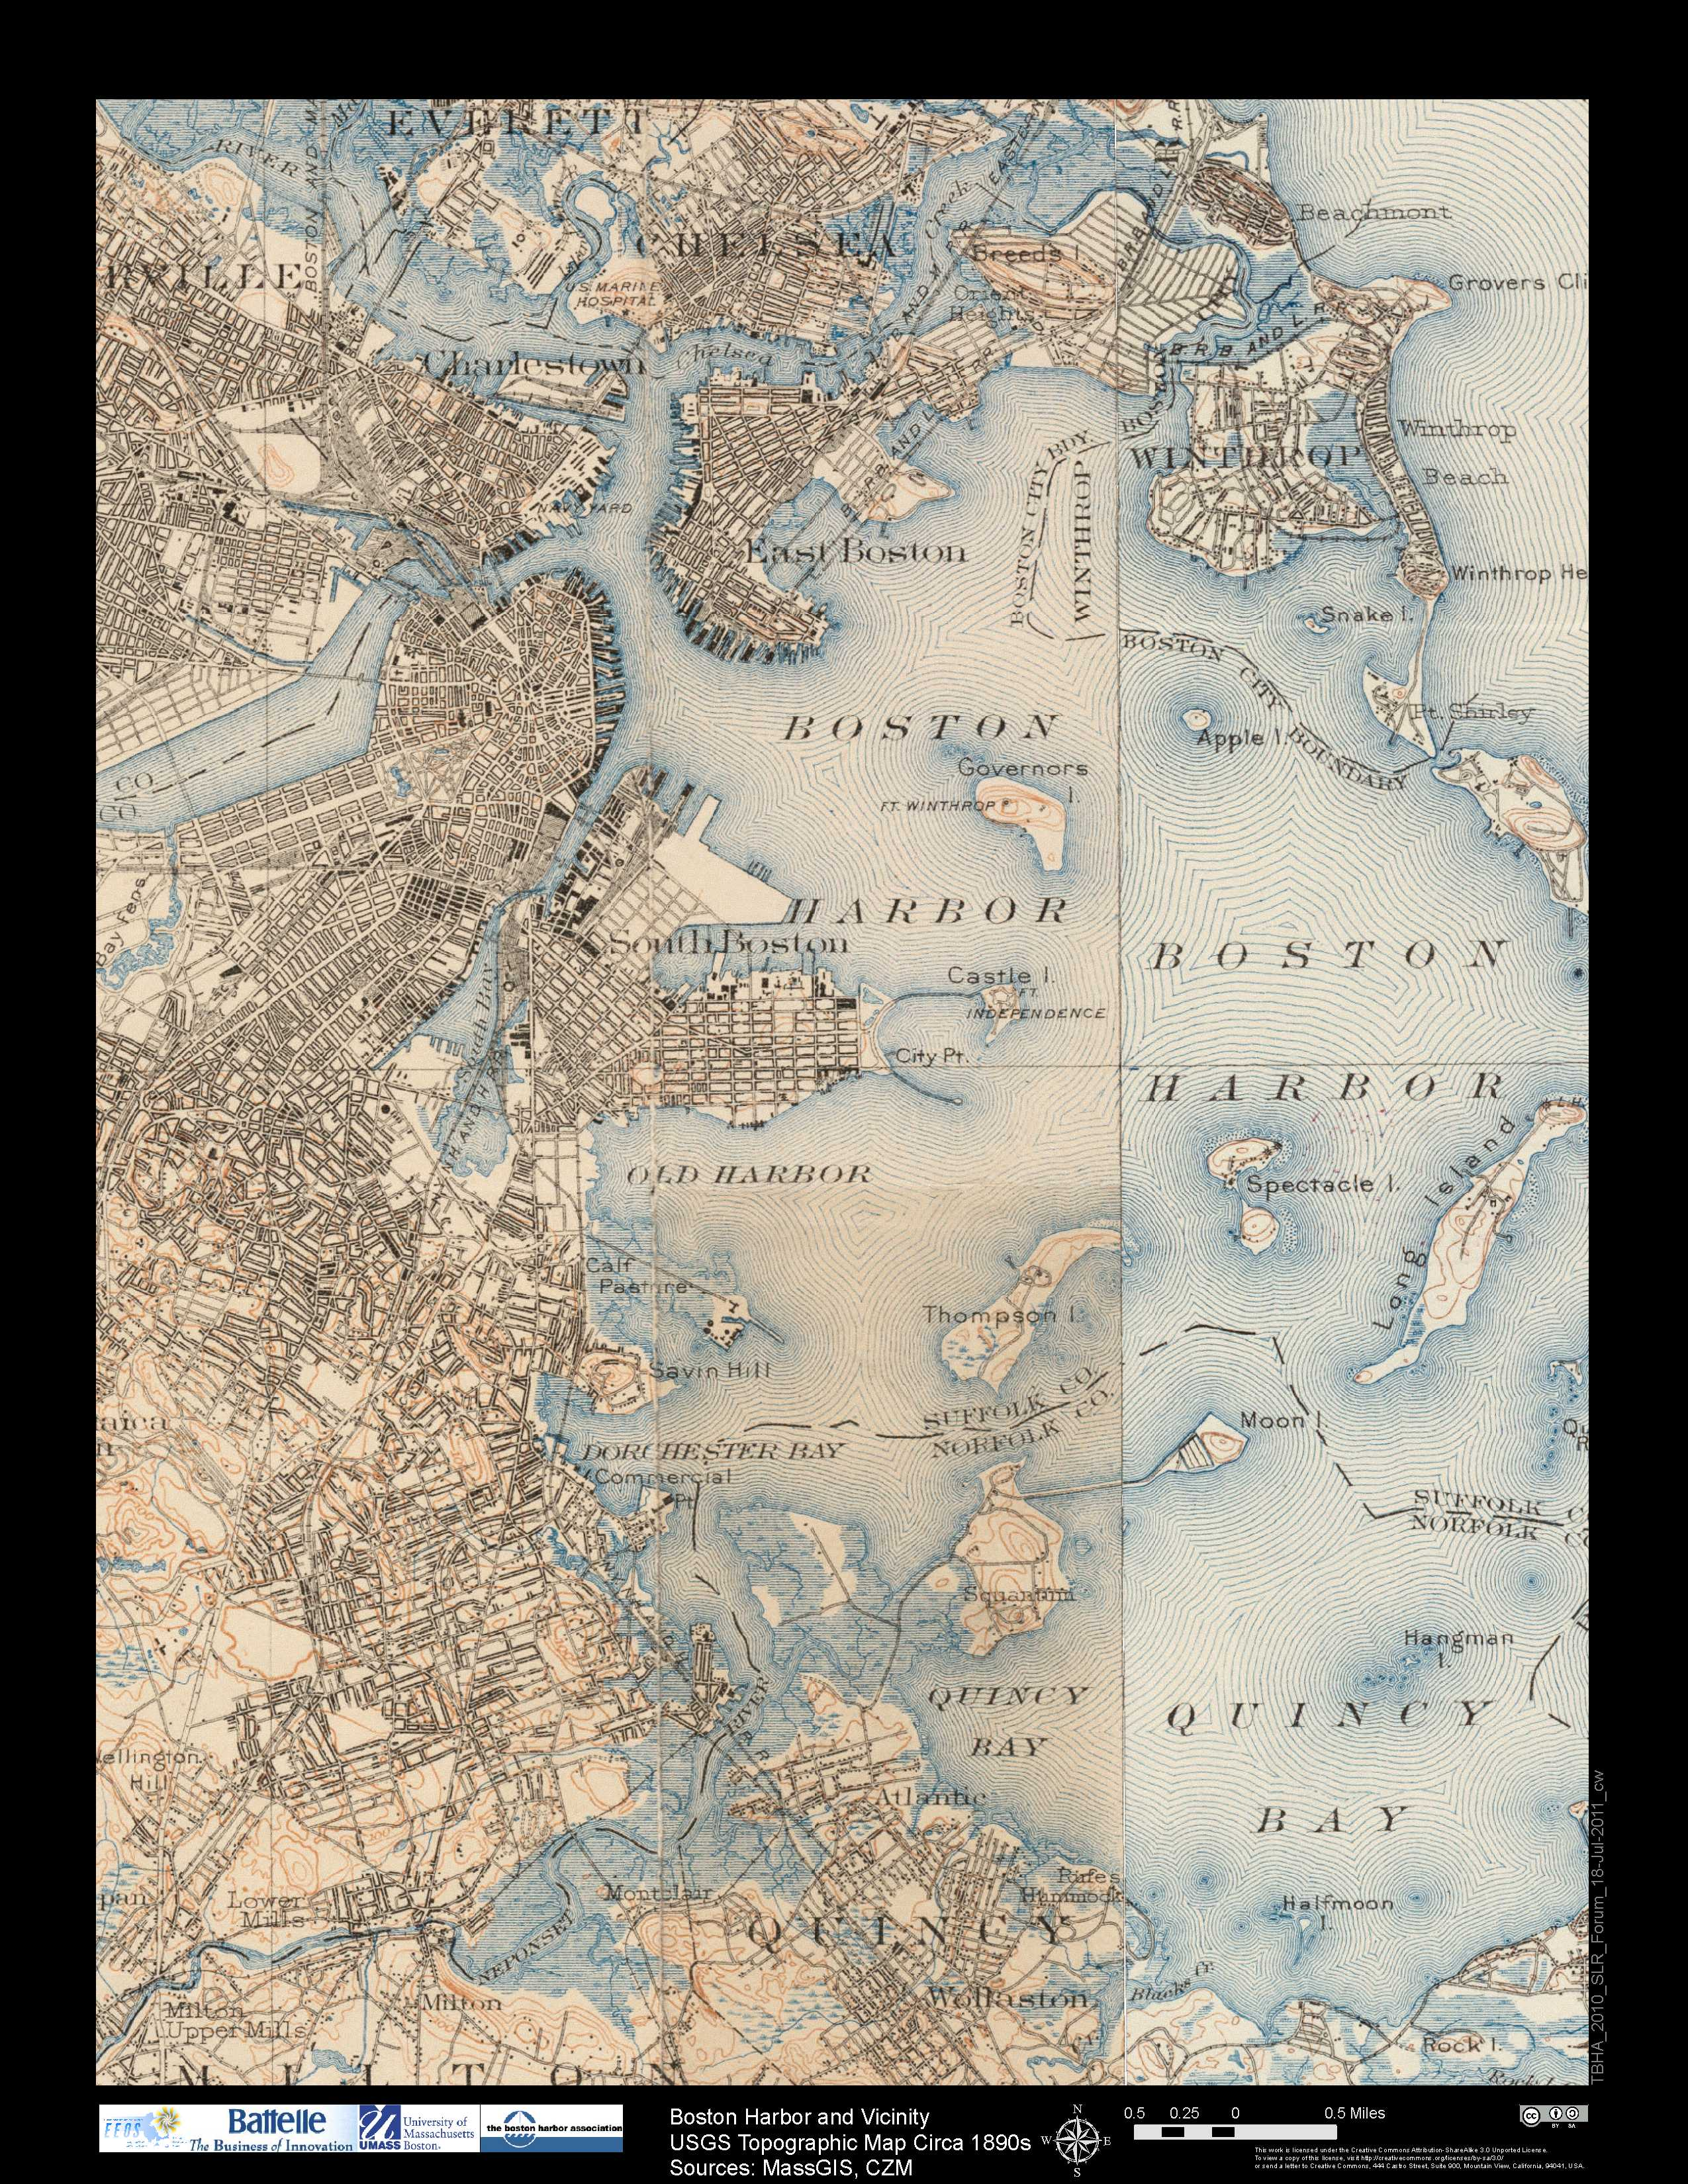 Flood Maps Boston Harbor Now Boston Harbor Now - Map of boston vicinity